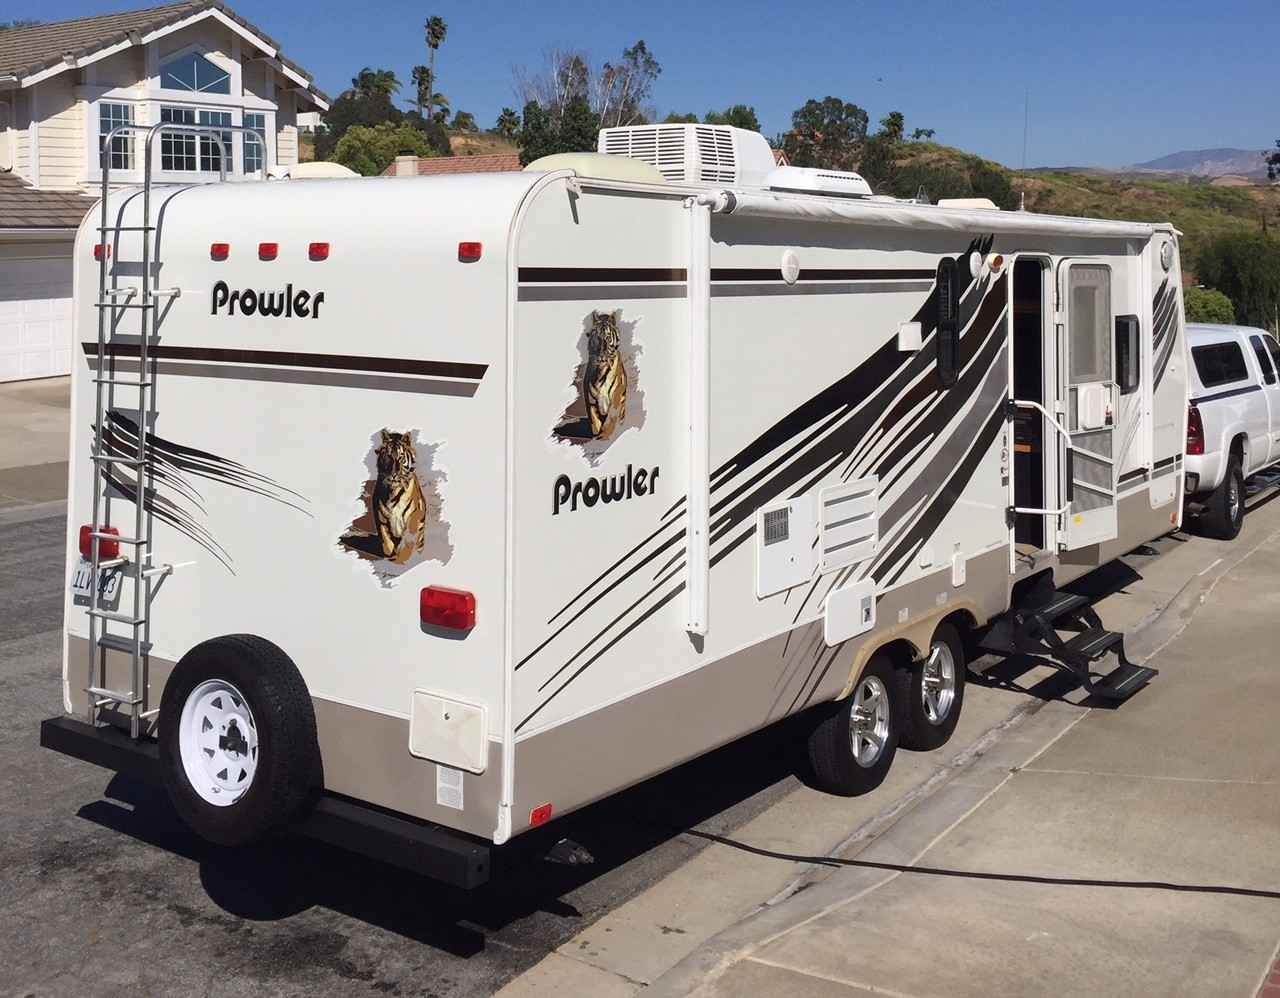 2009 Used Fleetwood PROWLER 250RLS Travel Trailer in ...